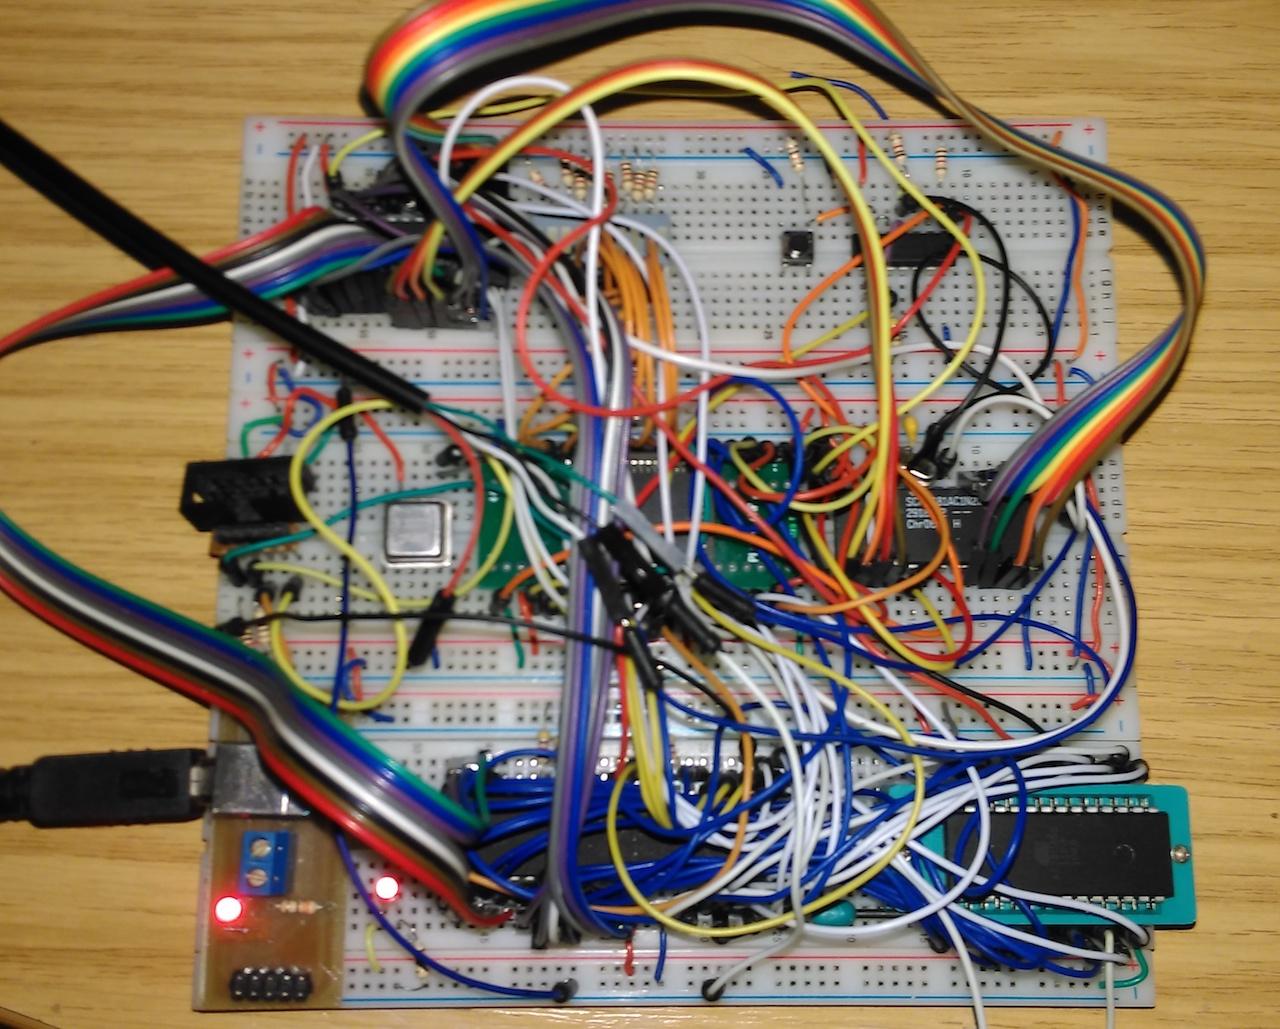 Being Sensible A 68008 Computer On Breadboard Aslak S Blog